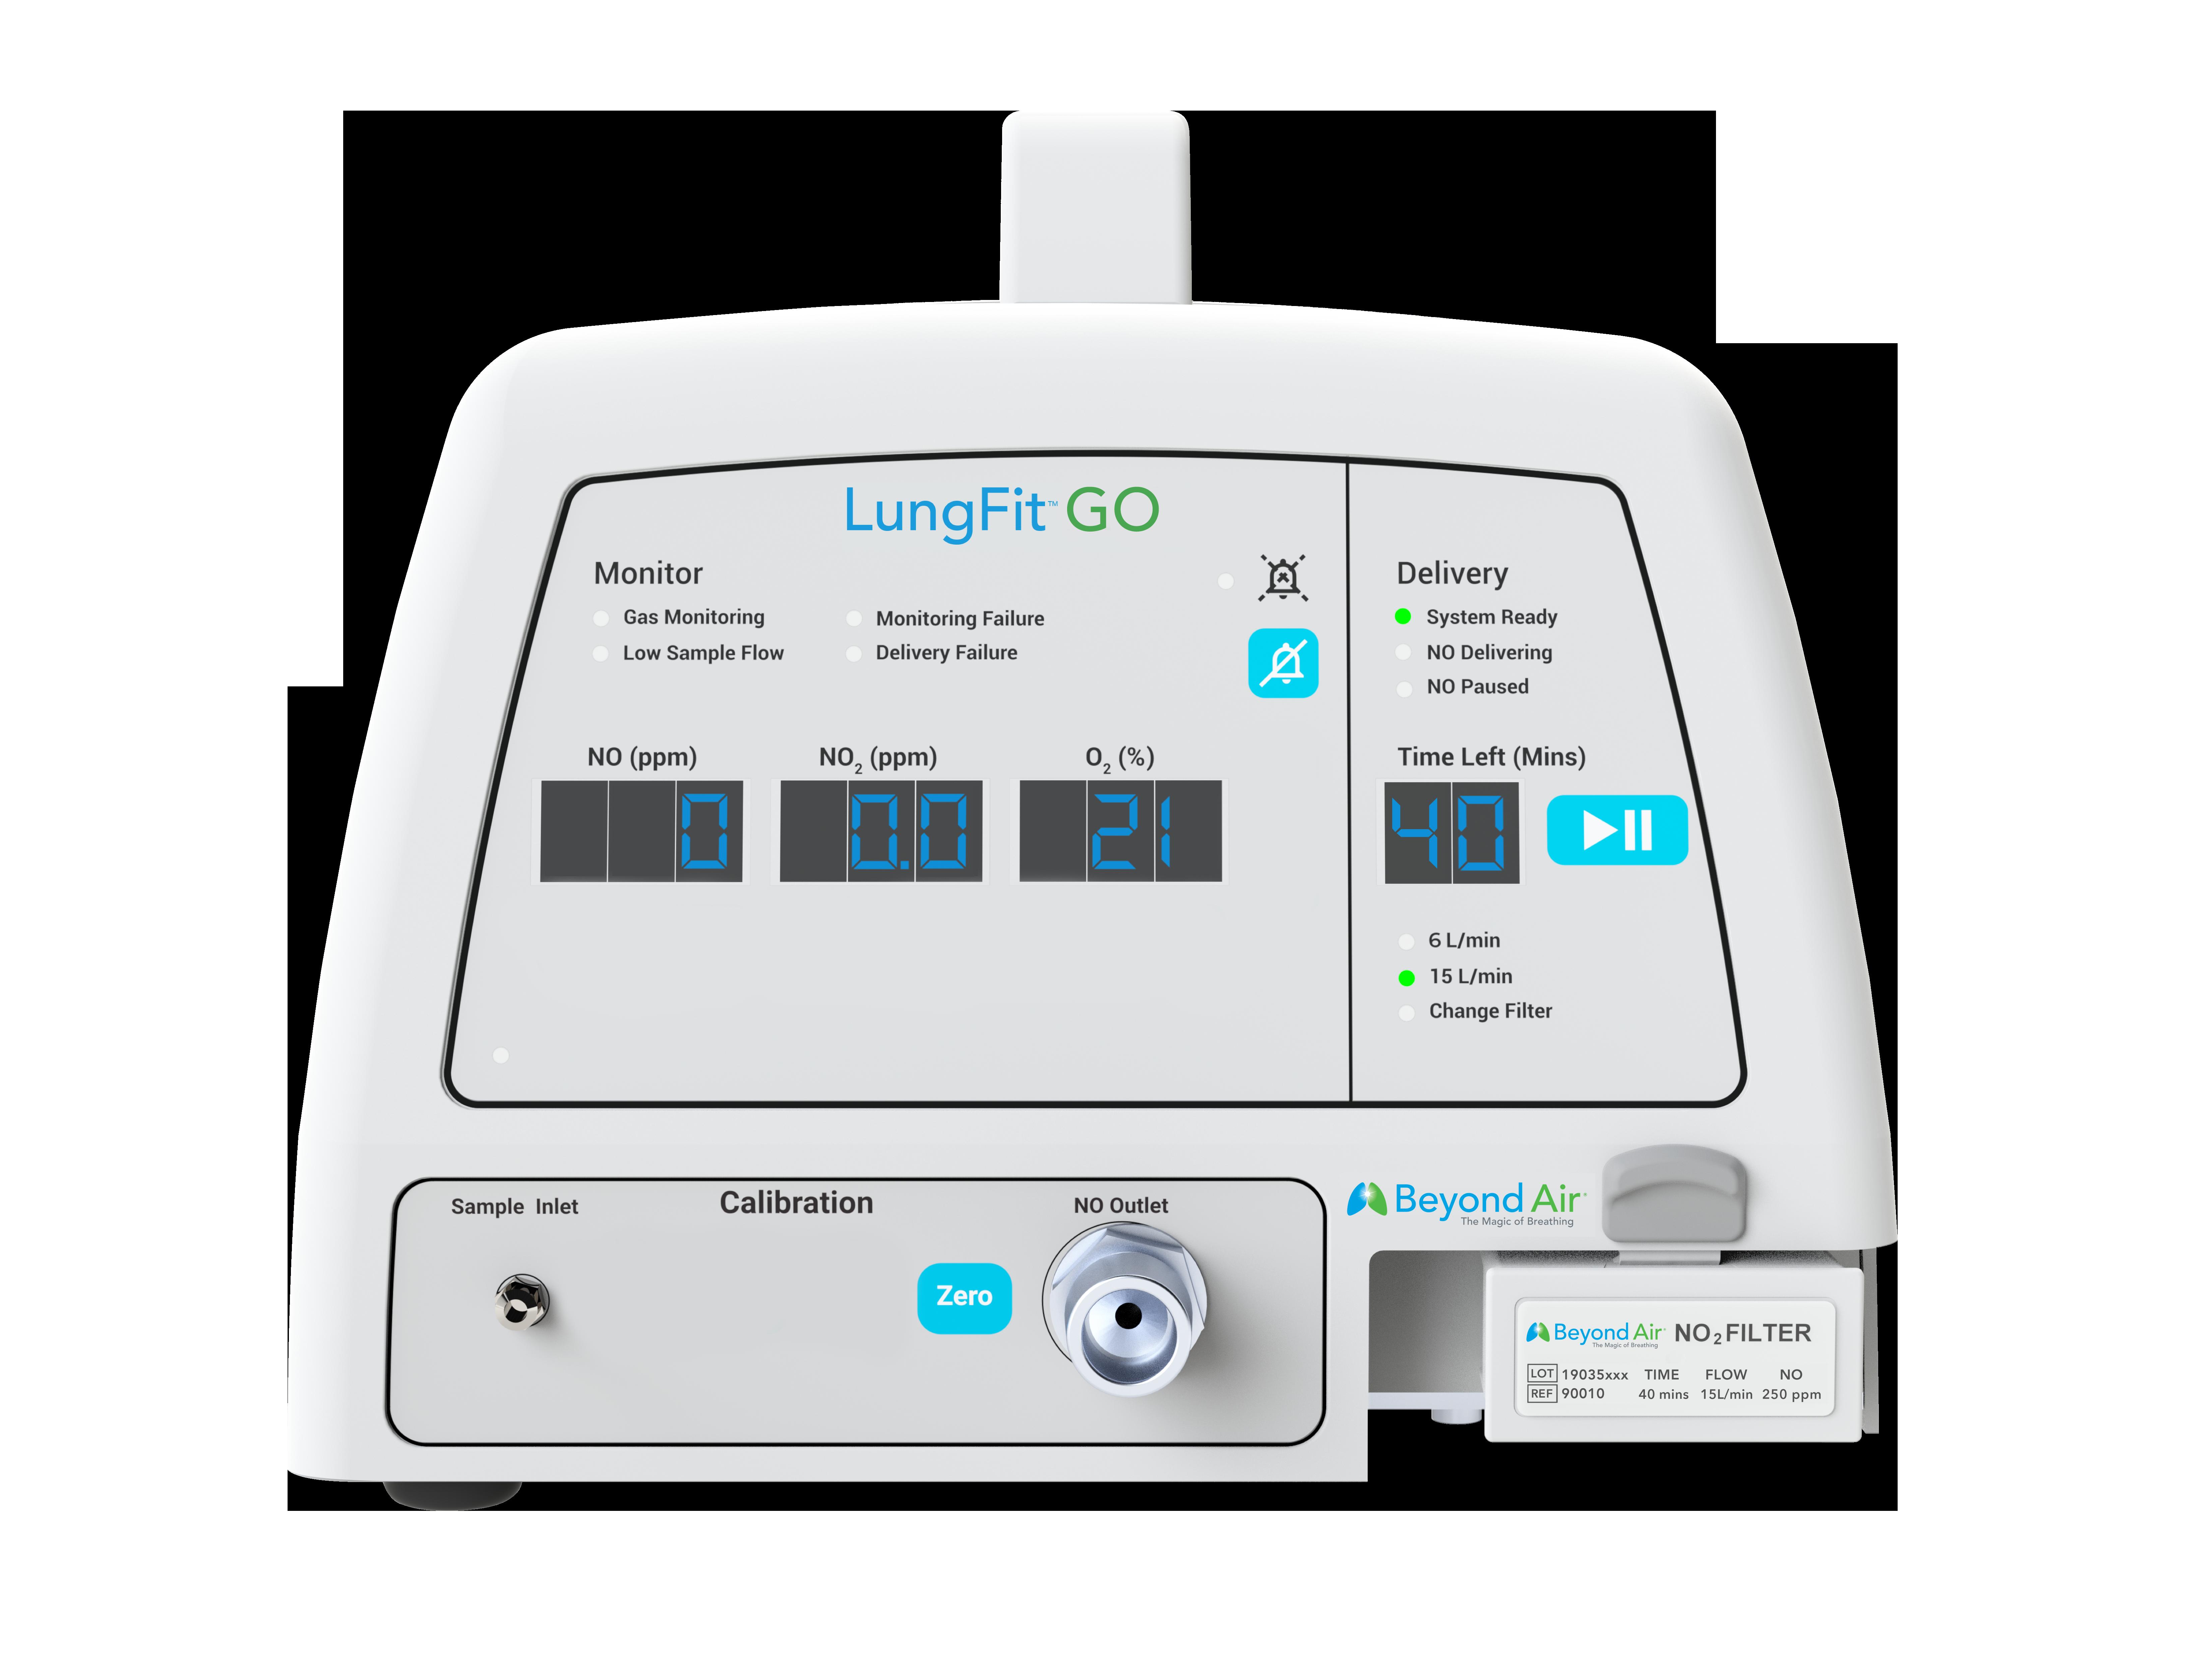 LungFit GO